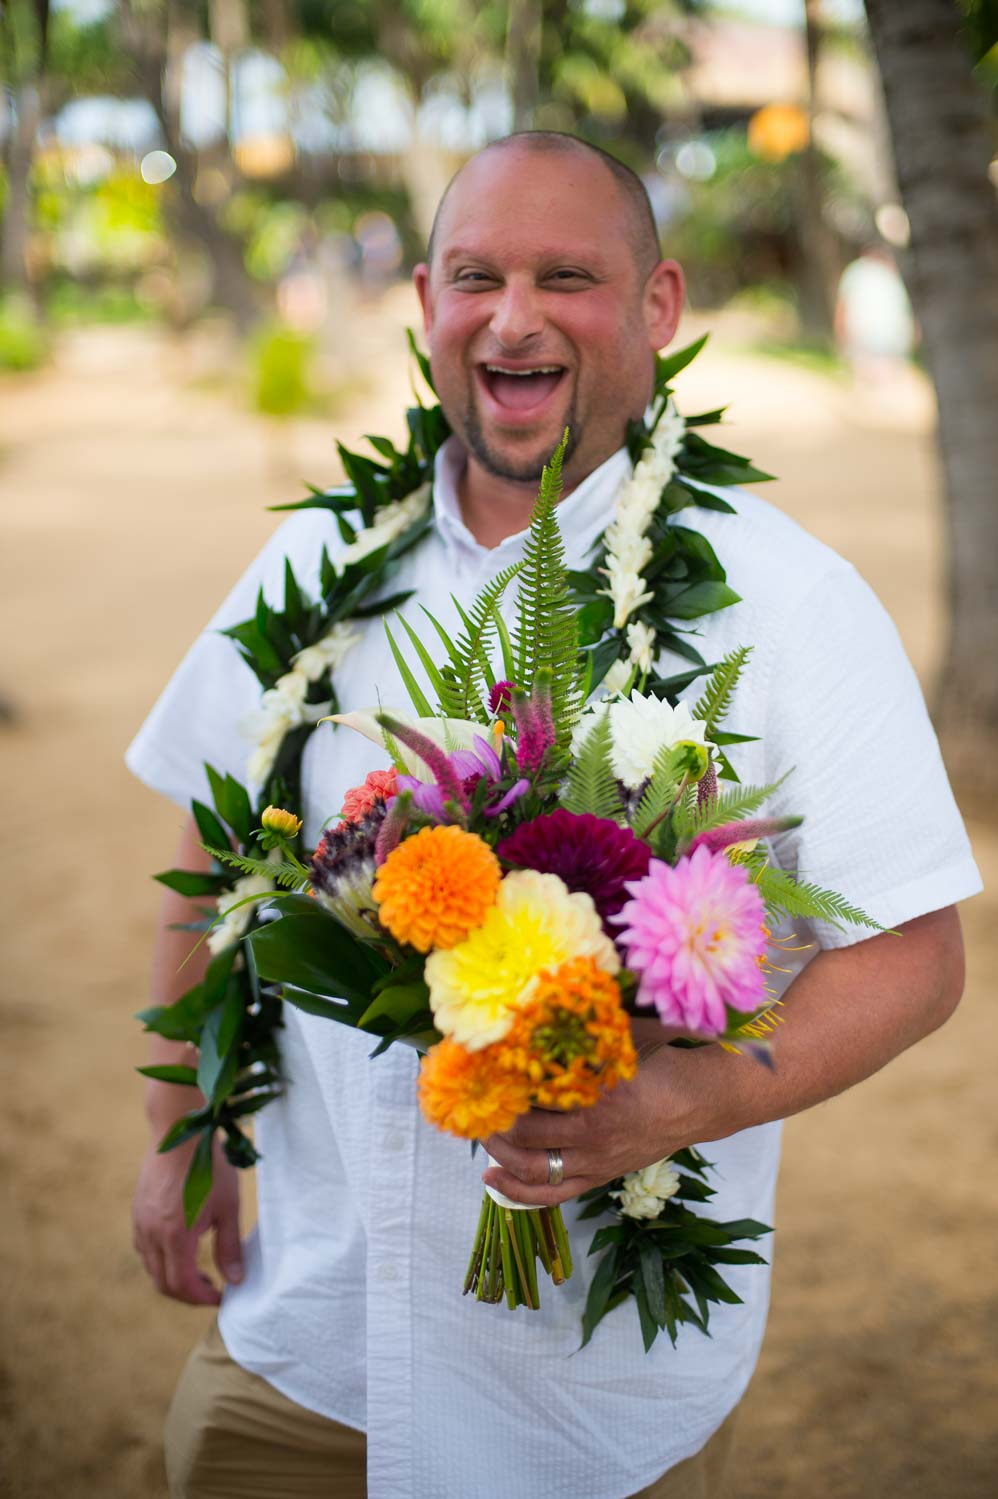 maui-wedding-photography-maui-wedding-venue-Tad-Craig-Photography-29.jpg